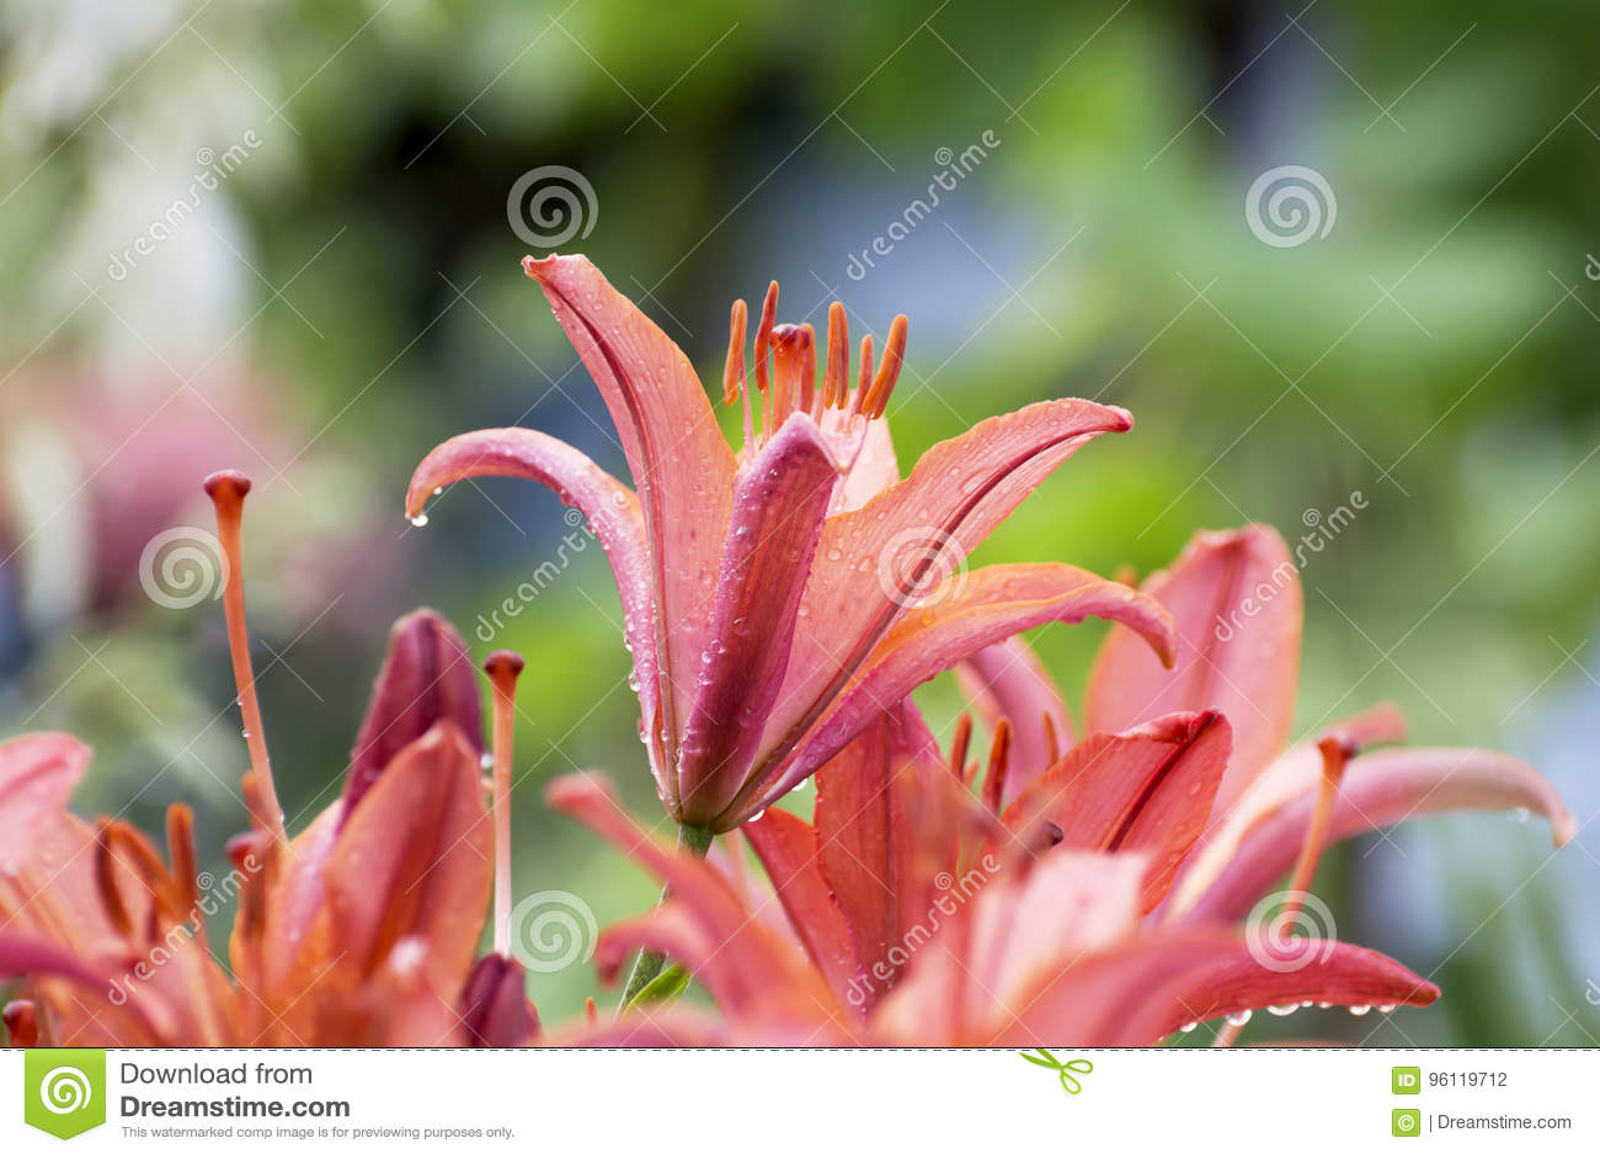 Orange lily flowers on blurred background stock photo image of orange lily flowers on blurred background izmirmasajfo